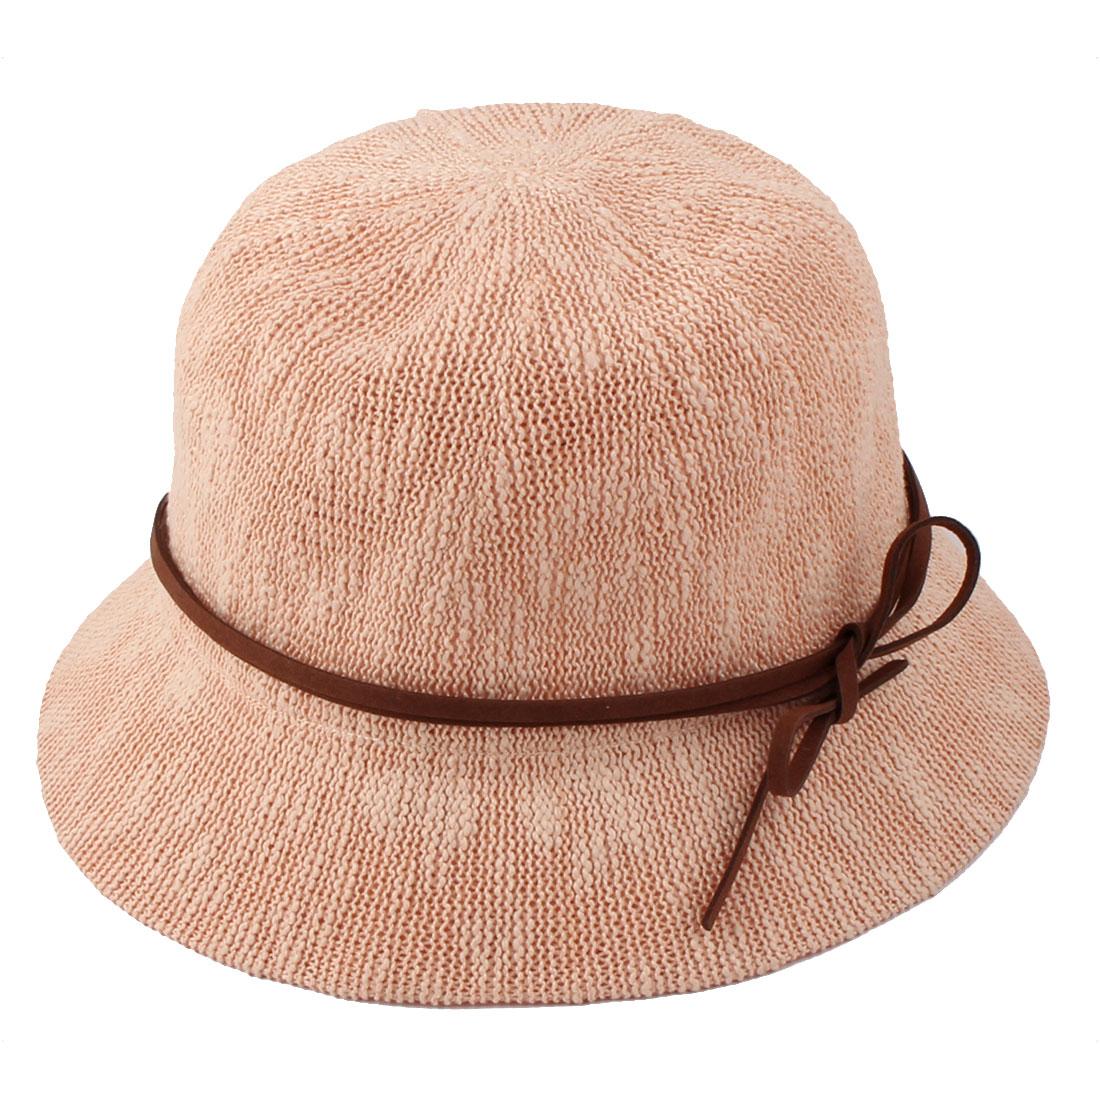 Ladies Women Straw Decoration Foldable Summer Protective Traveling Wide Brim Sun Cap Beach Fishing Hat Light Pink